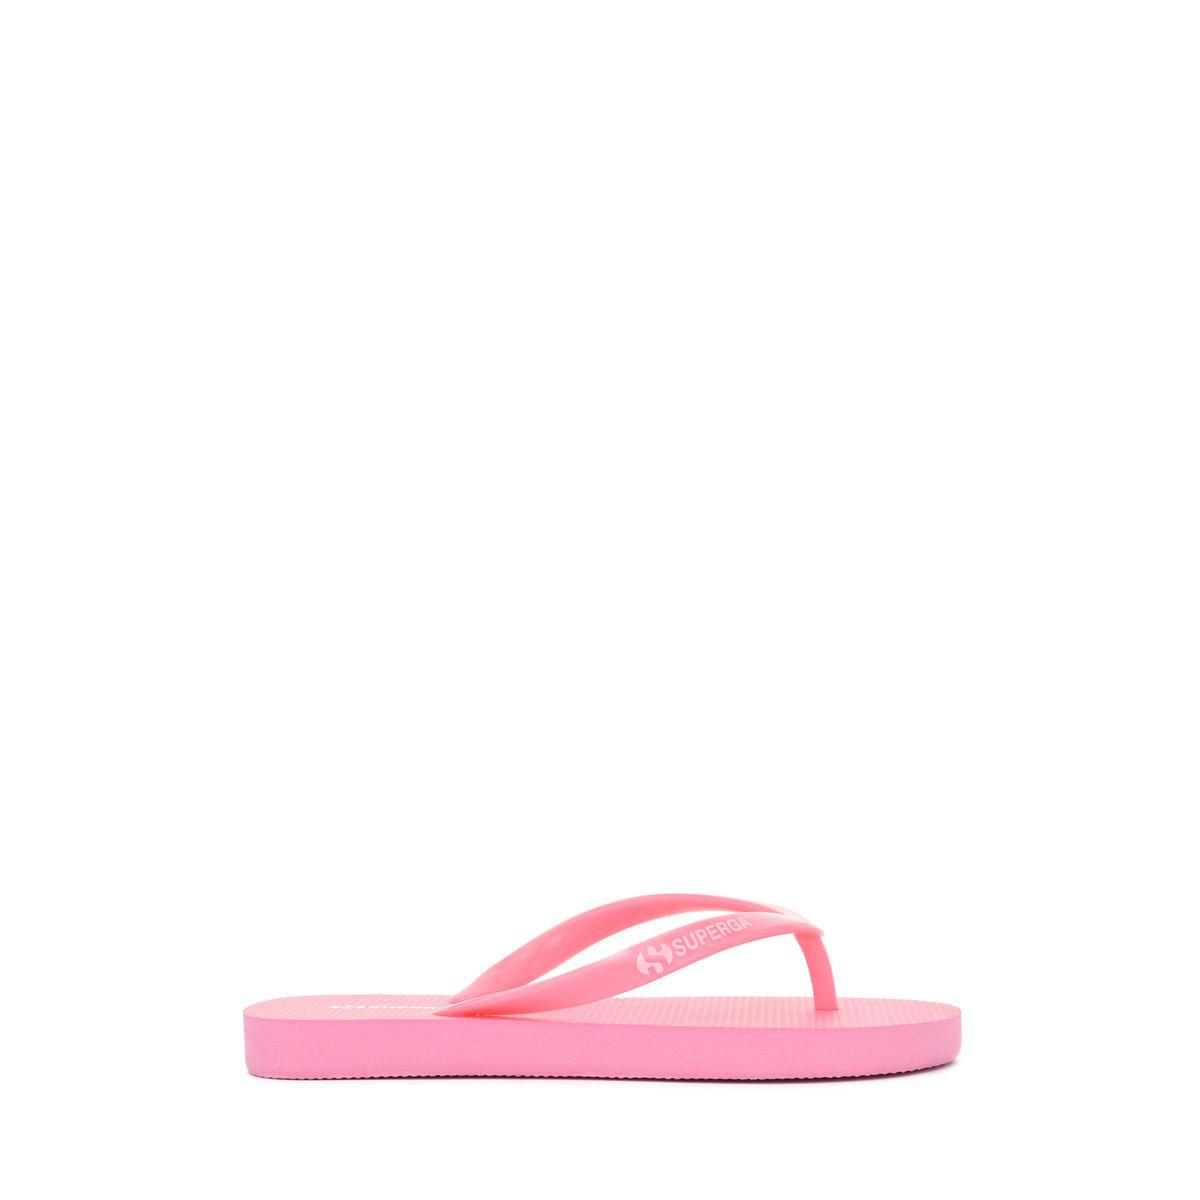 Slippers Superga bambino/a-S111G8W